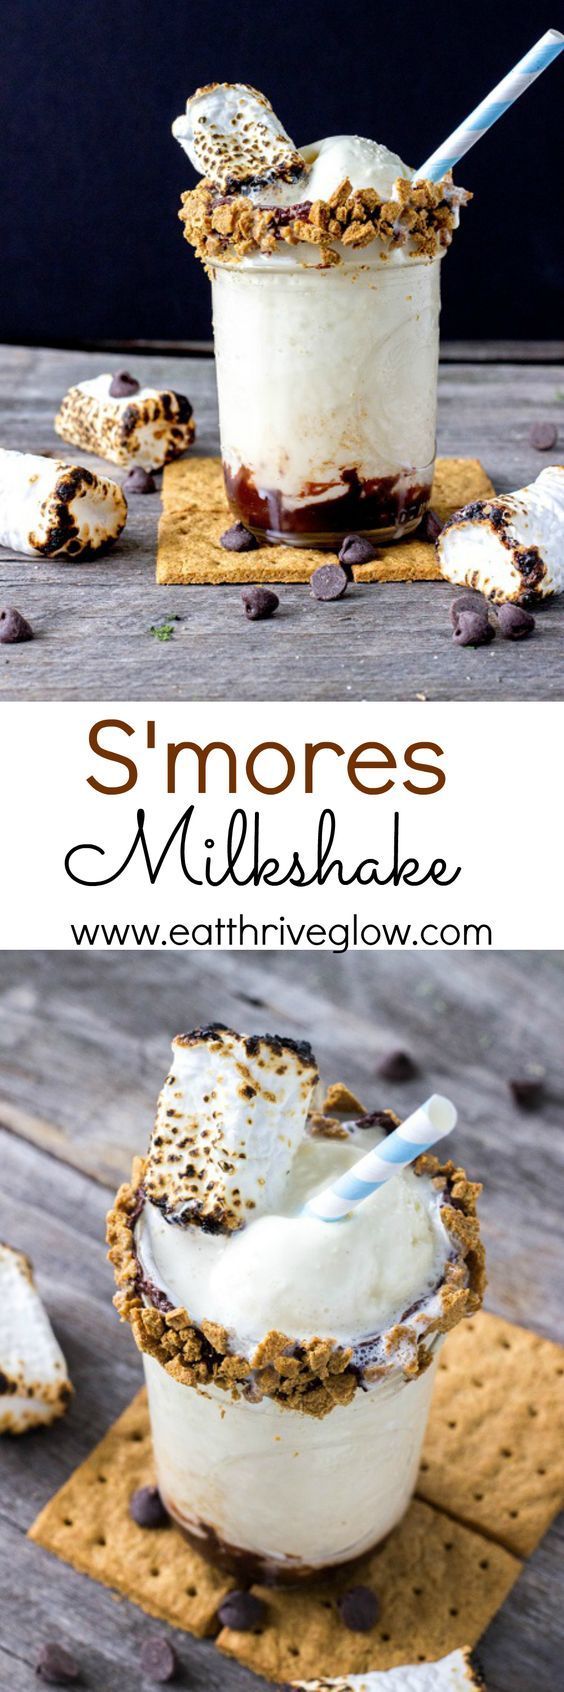 S'mores toasted marshmallow milkshake recipe with homemade fudge, vanilla ice cream, and a dark chocolate and graham cracker rim. Perfect s'mores dessert!